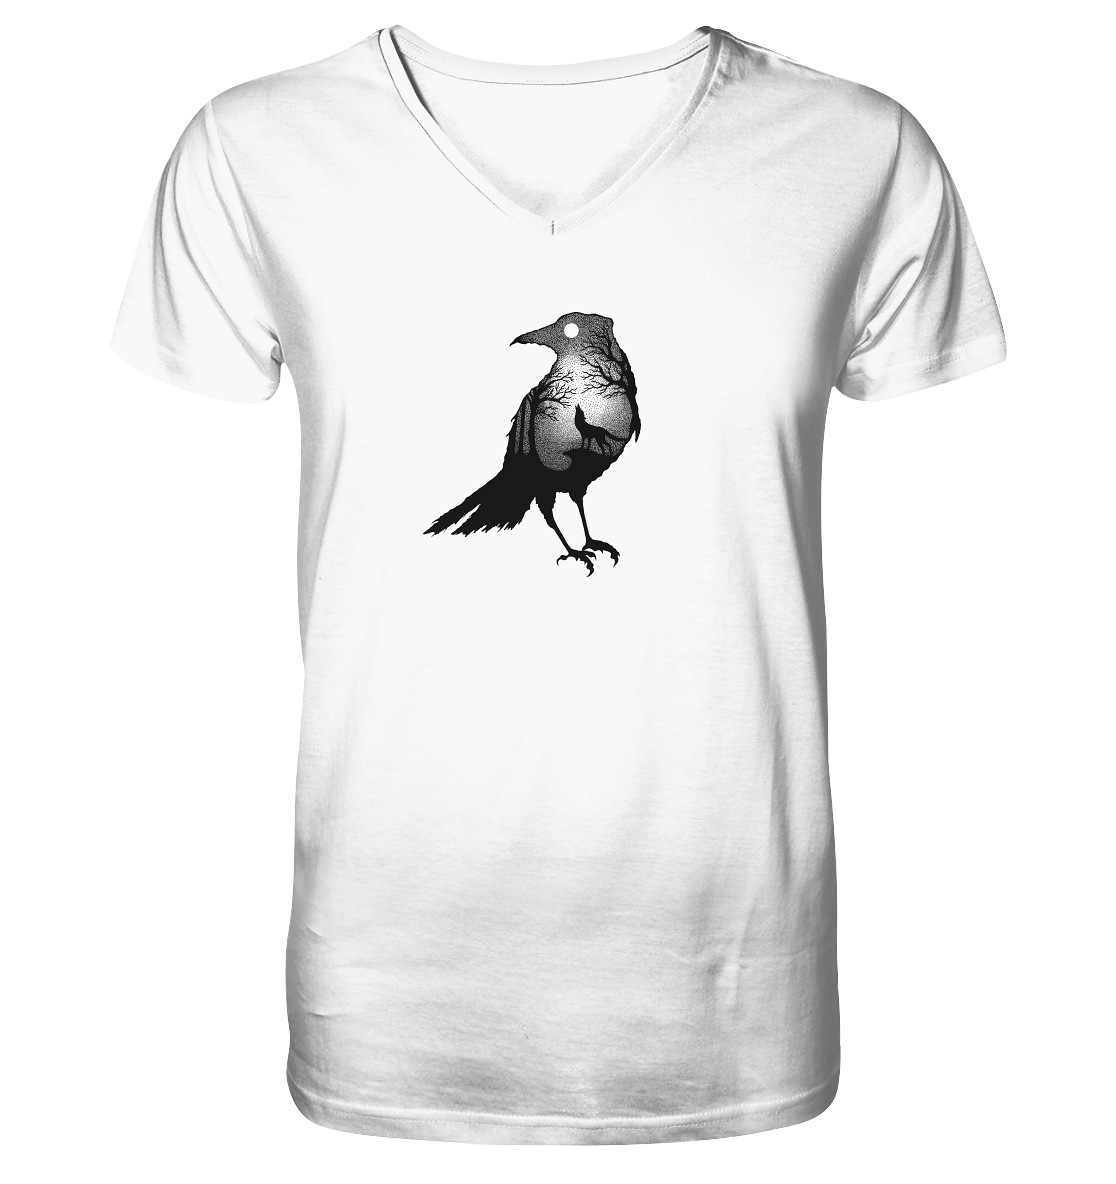 front-mens-organic-v-neck-shirt-f8f8f8-1116x-2.png